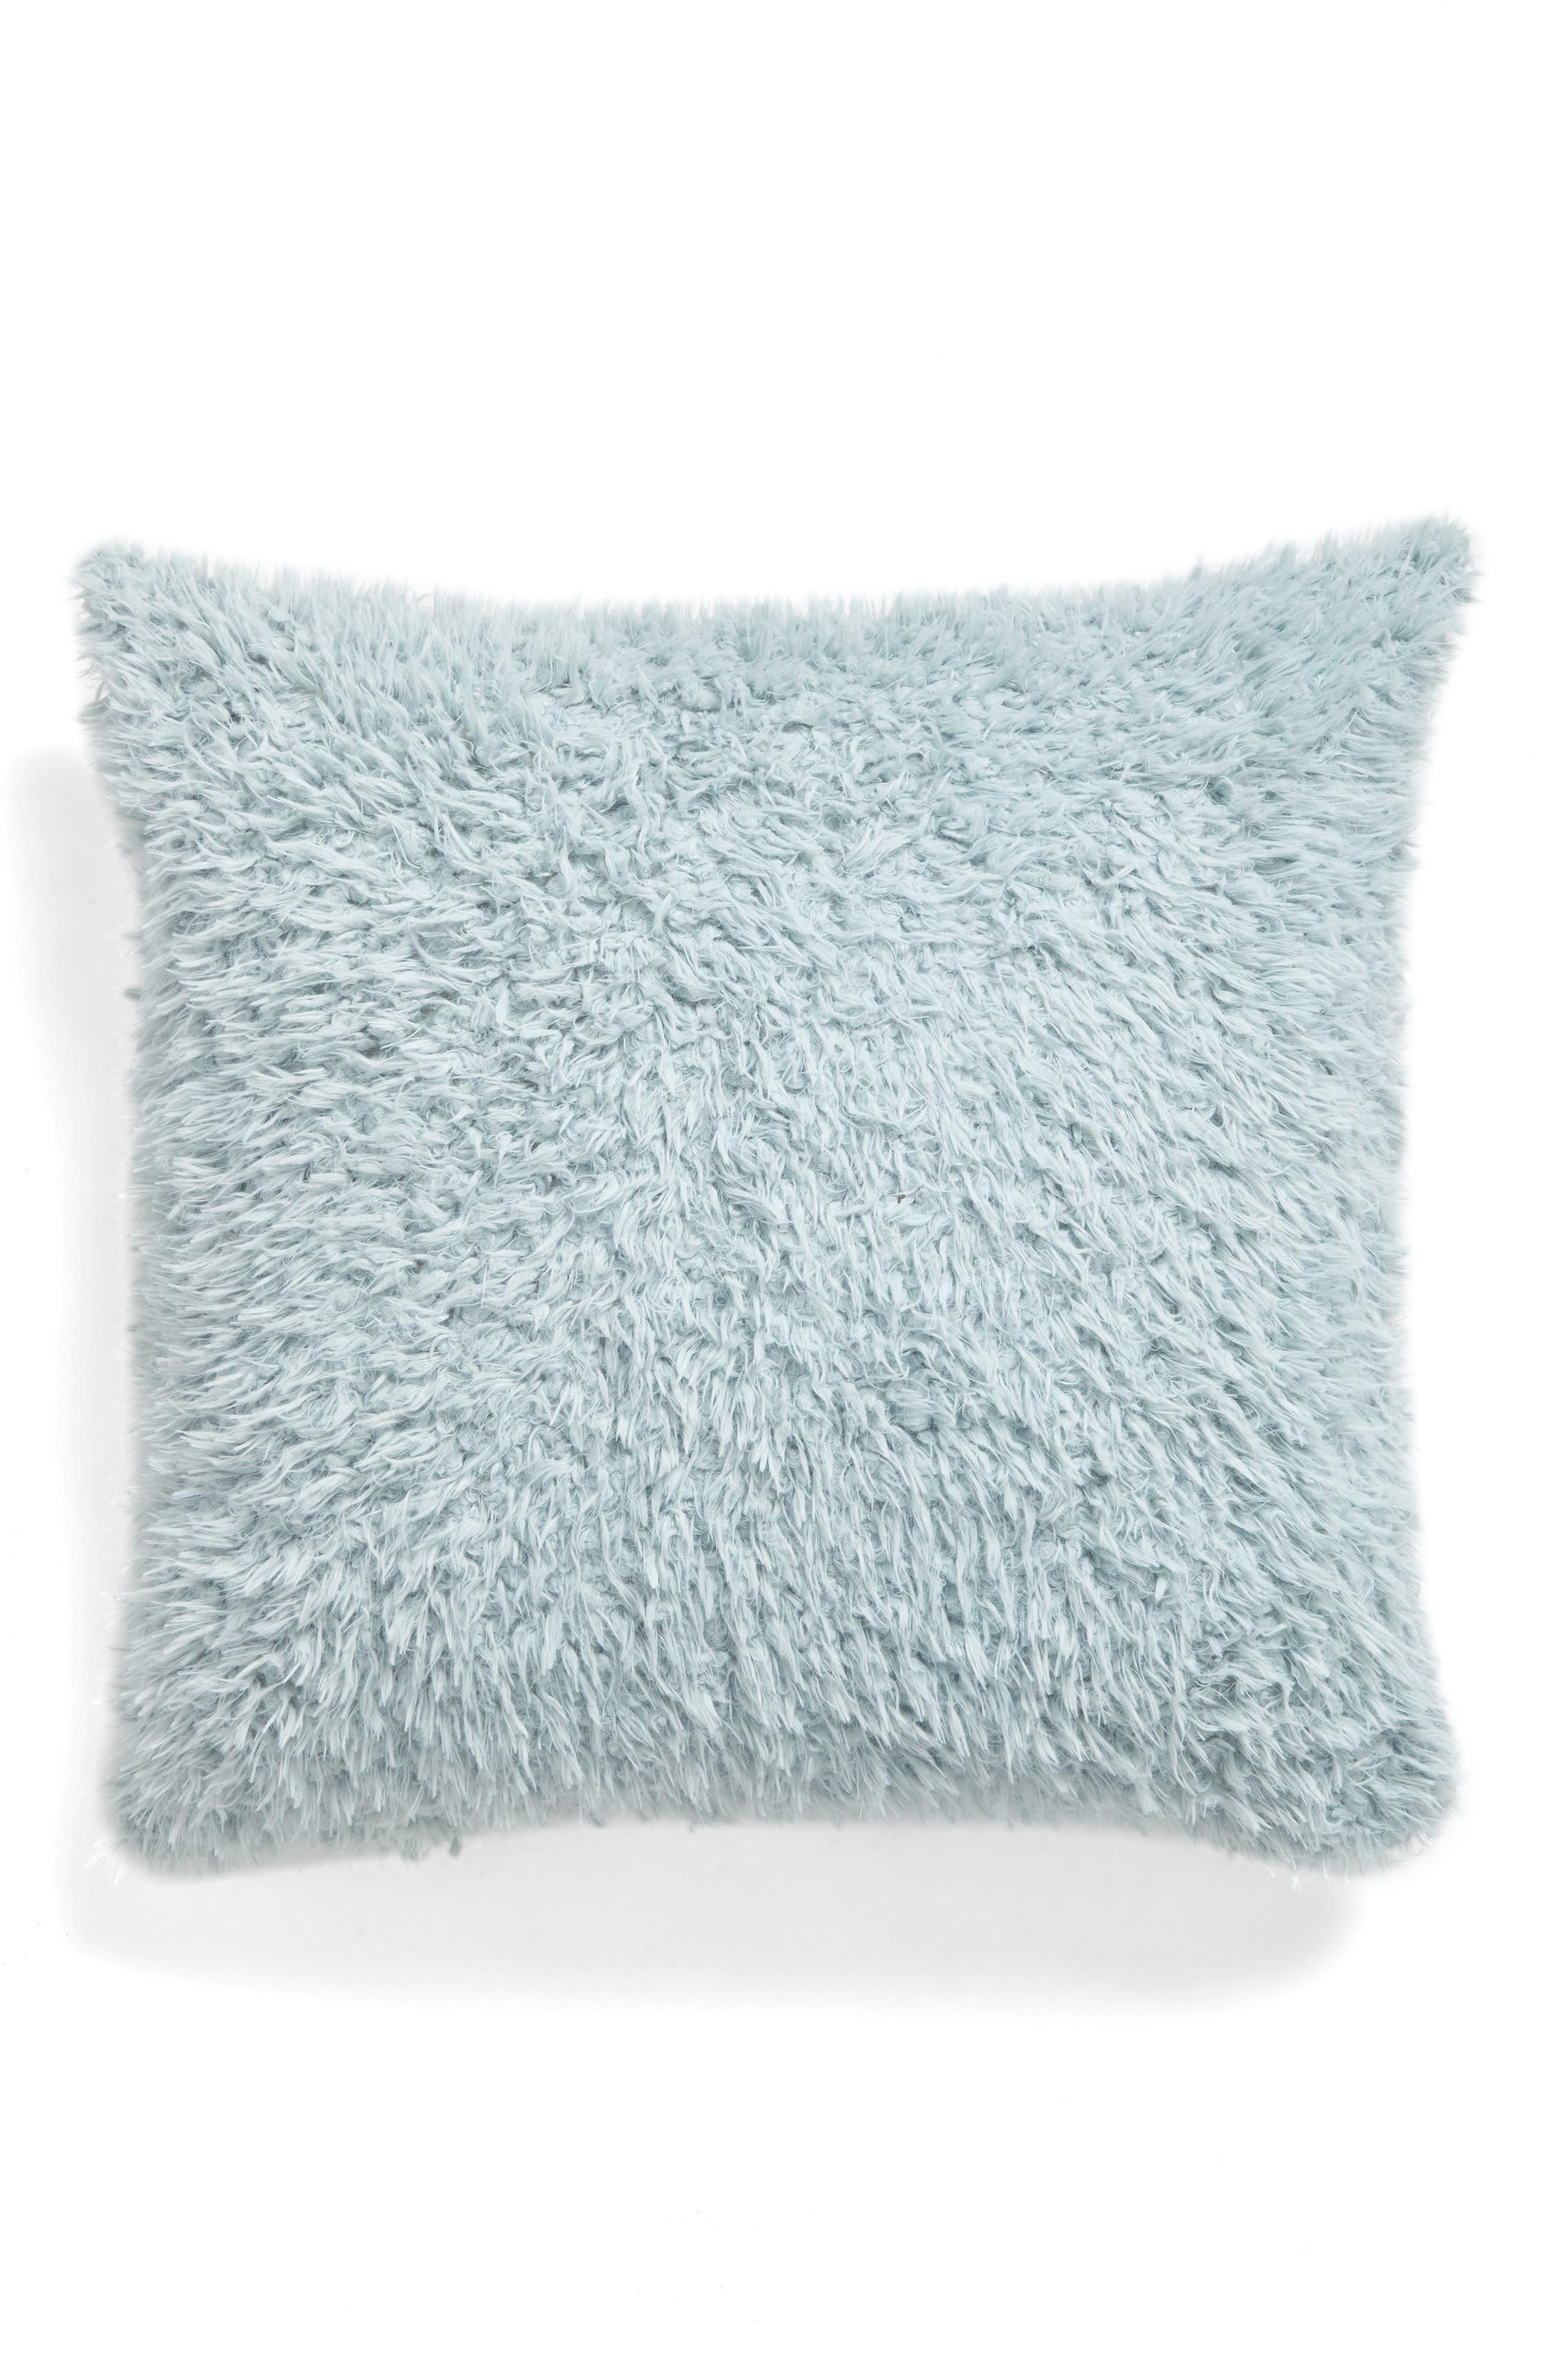 Shaggy Plush Pillow,                             Main thumbnail 1, color,                             Green Soft